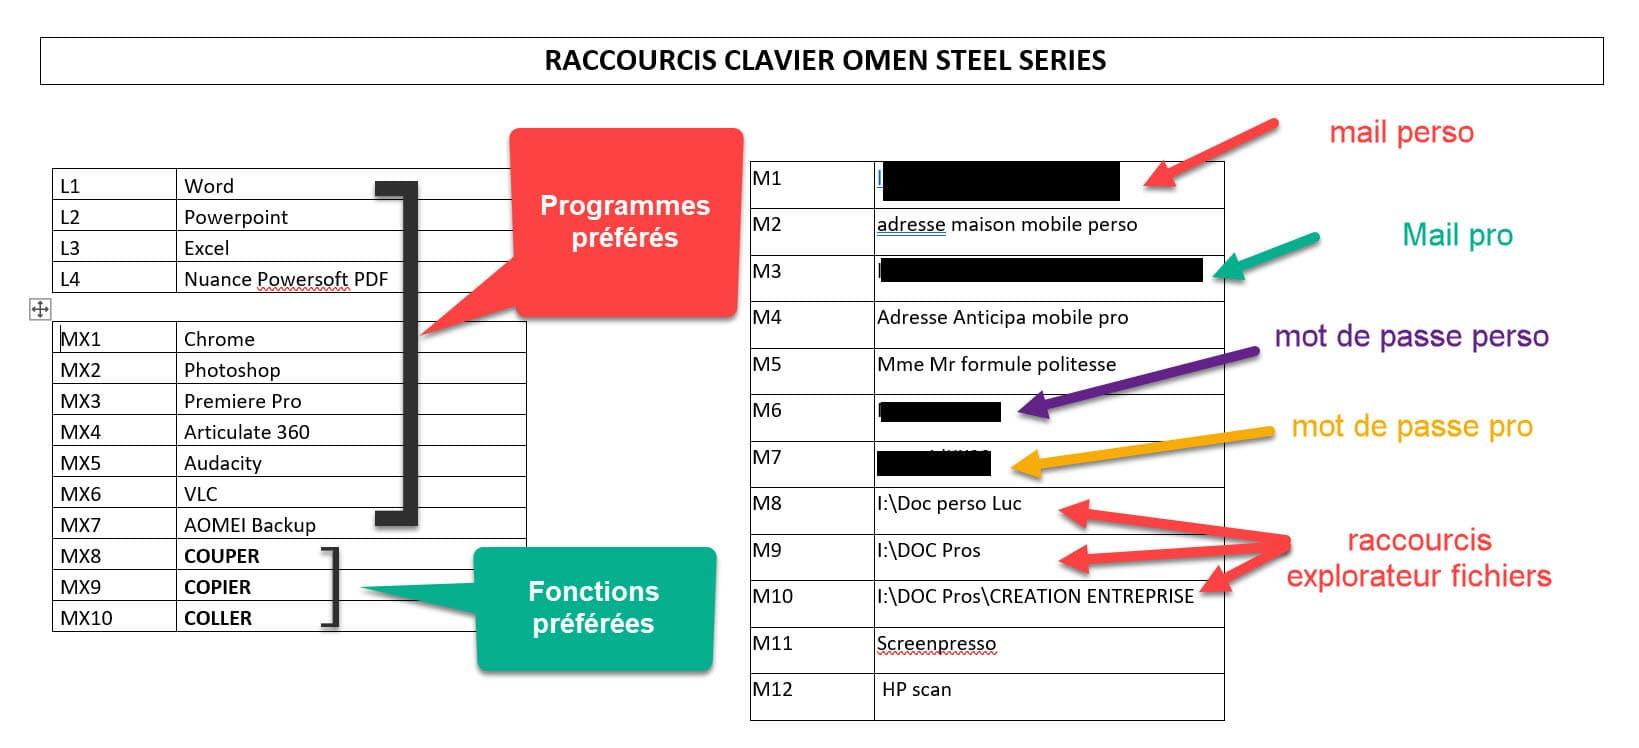 Raccourcis clavier OMEN by HP Steel Series